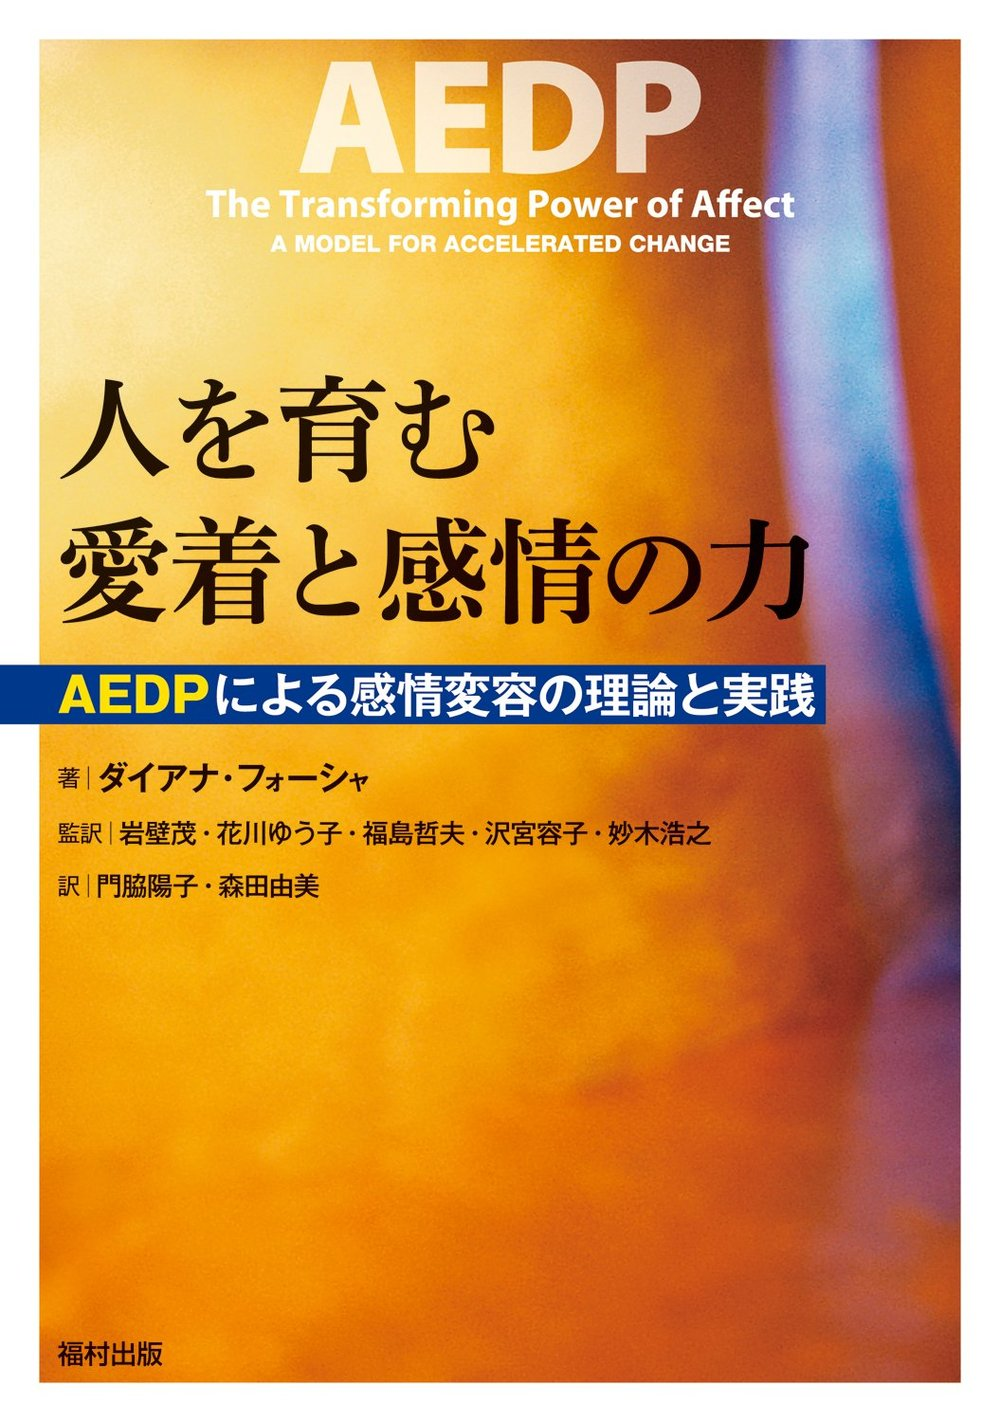 AEDP創始者ダイアナ・フォーシャの本「人を育む愛着と感情の力」待望の日本語翻訳本が出版されました。 - 購入はこちらから。